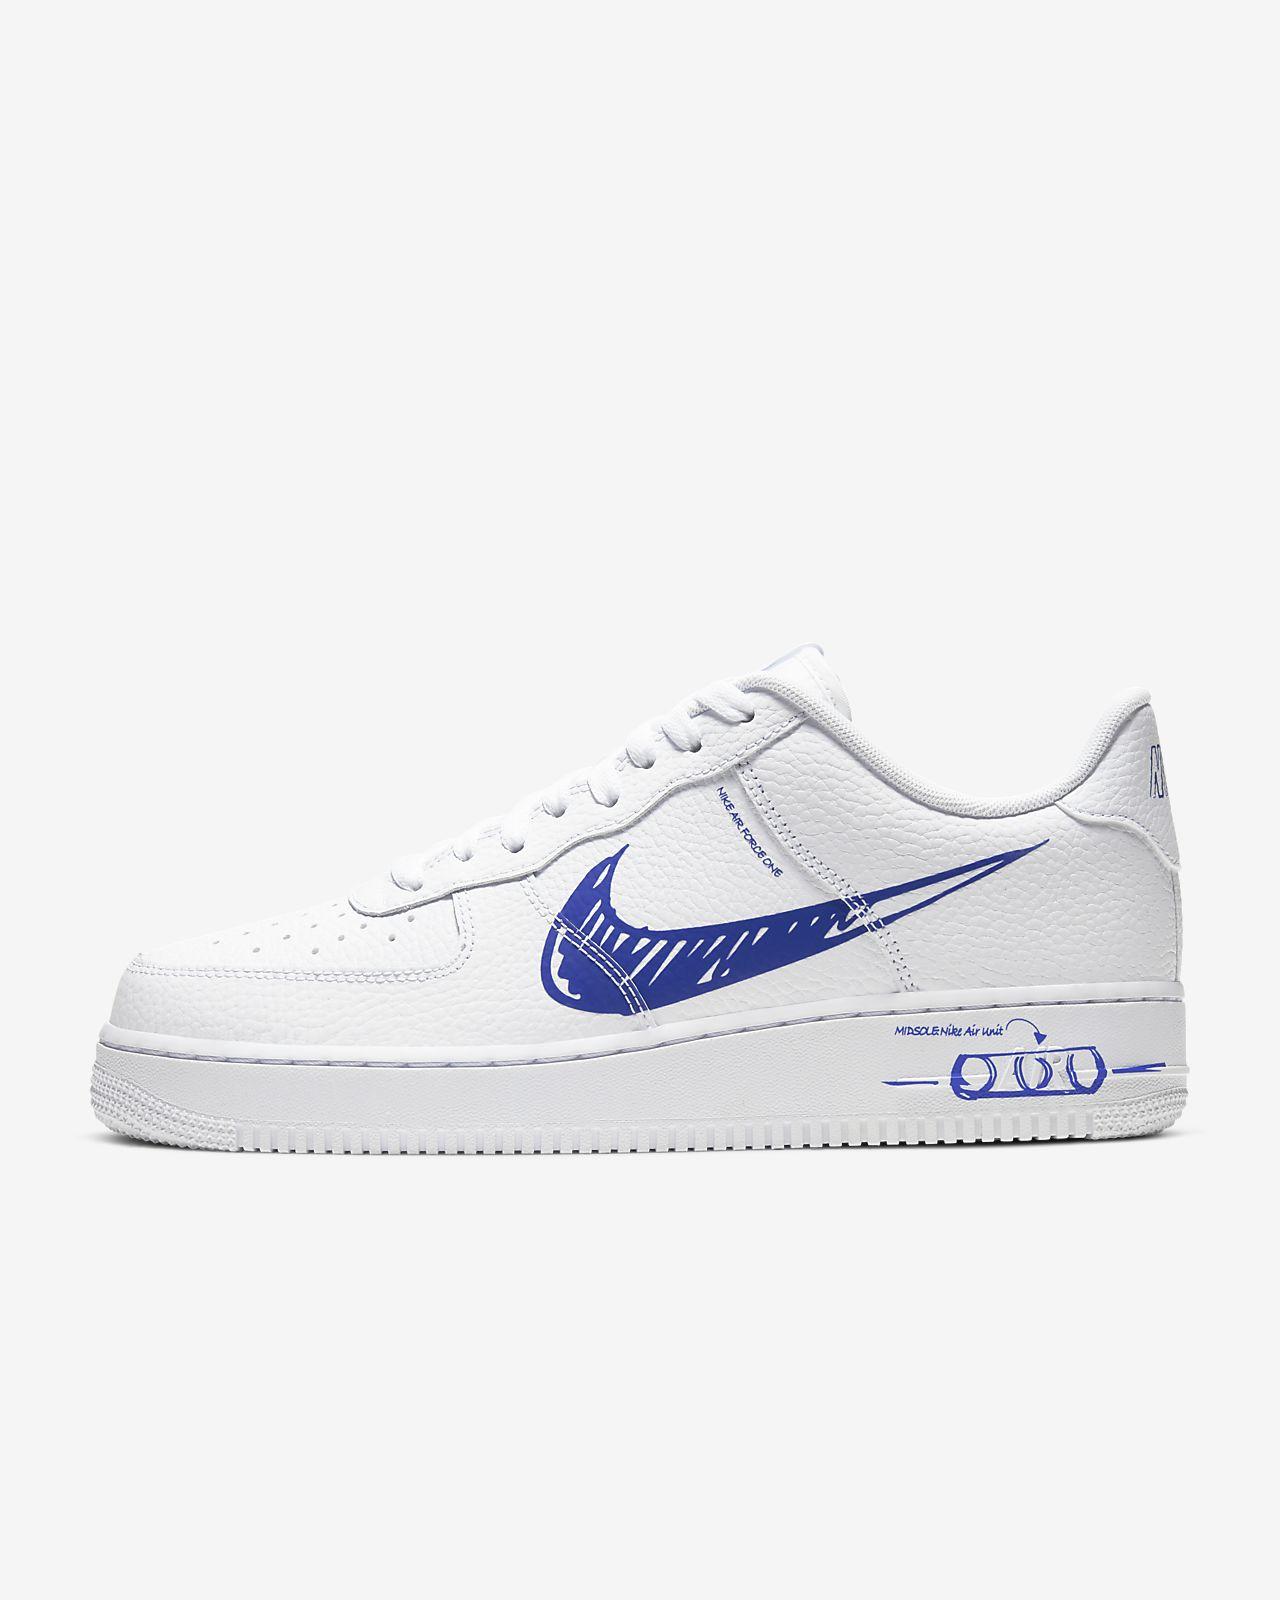 Nike Joggesko herre Størrelse 41 Herresko | XXL